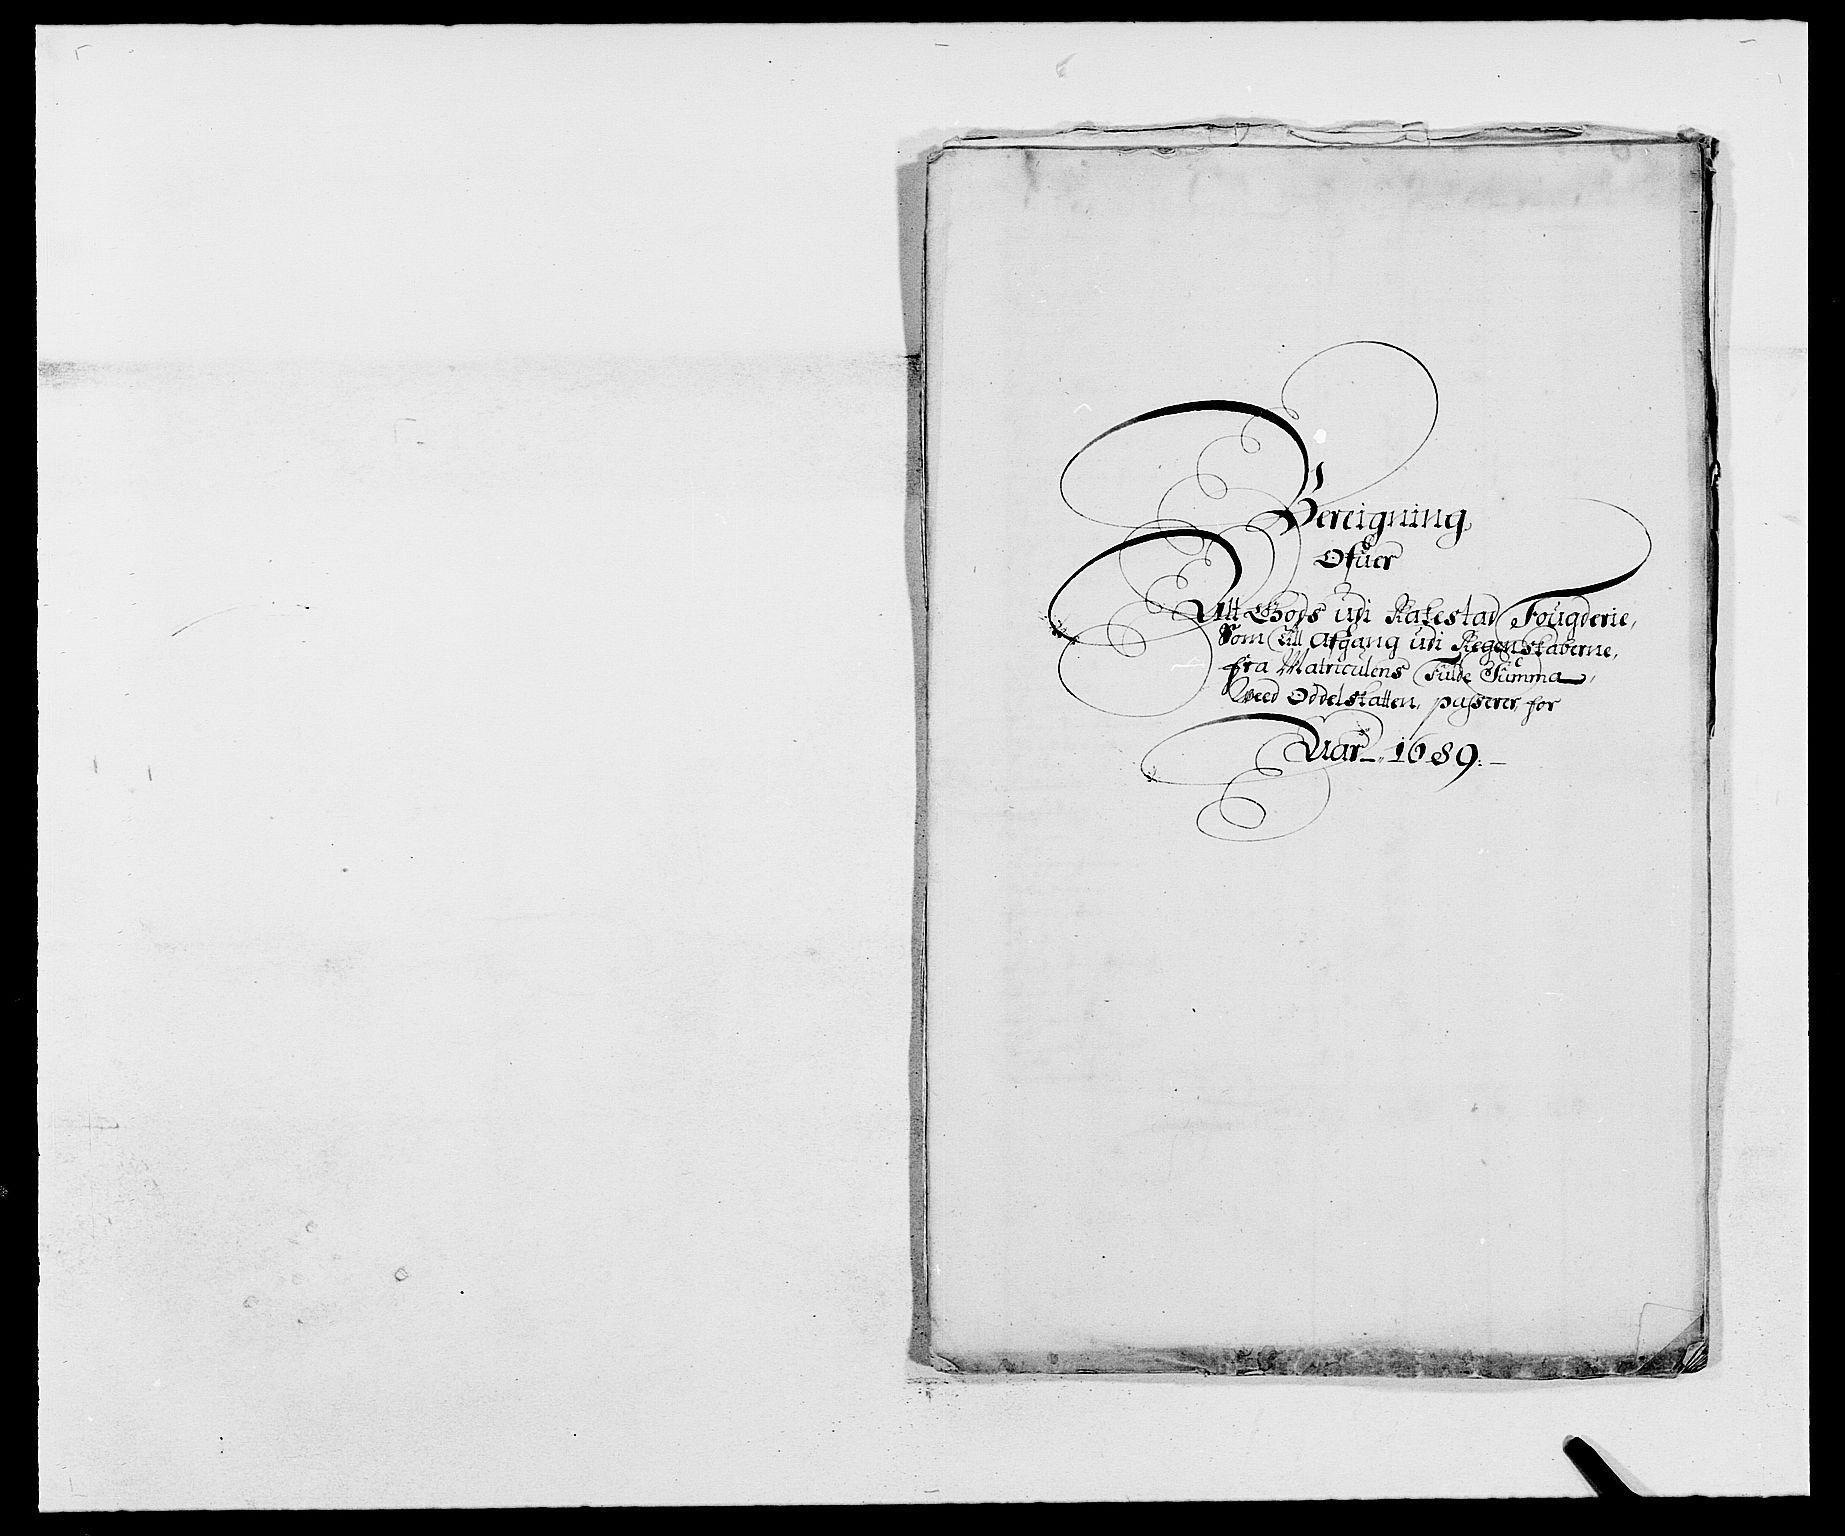 RA, Rentekammeret inntil 1814, Reviderte regnskaper, Fogderegnskap, R05/L0277: Fogderegnskap Rakkestad, 1689-1690, s. 338